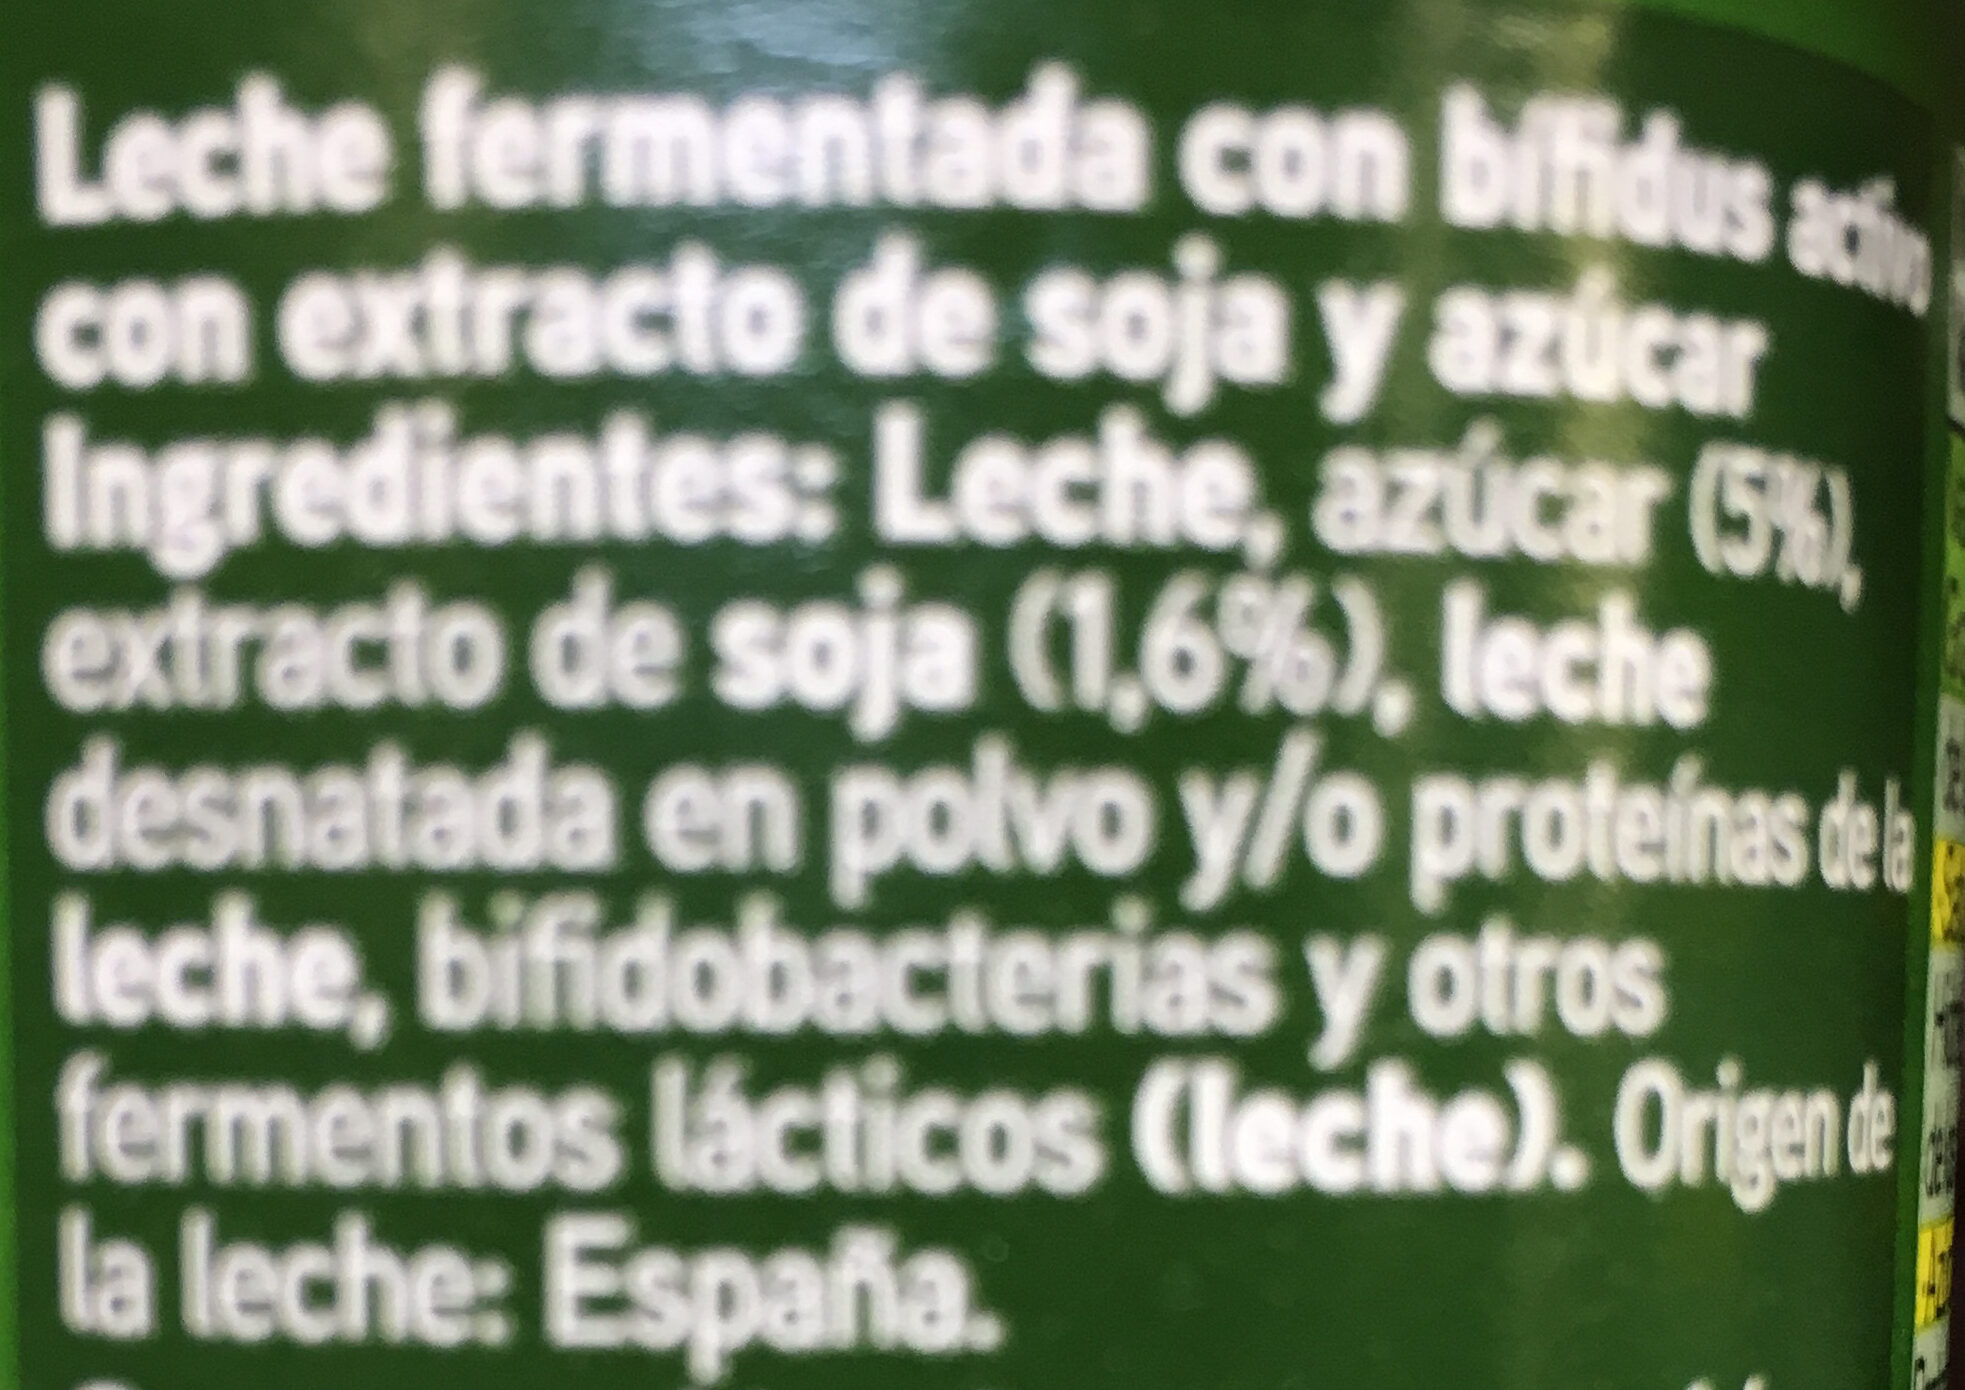 Yogur biactive con soja - Ingredients - es